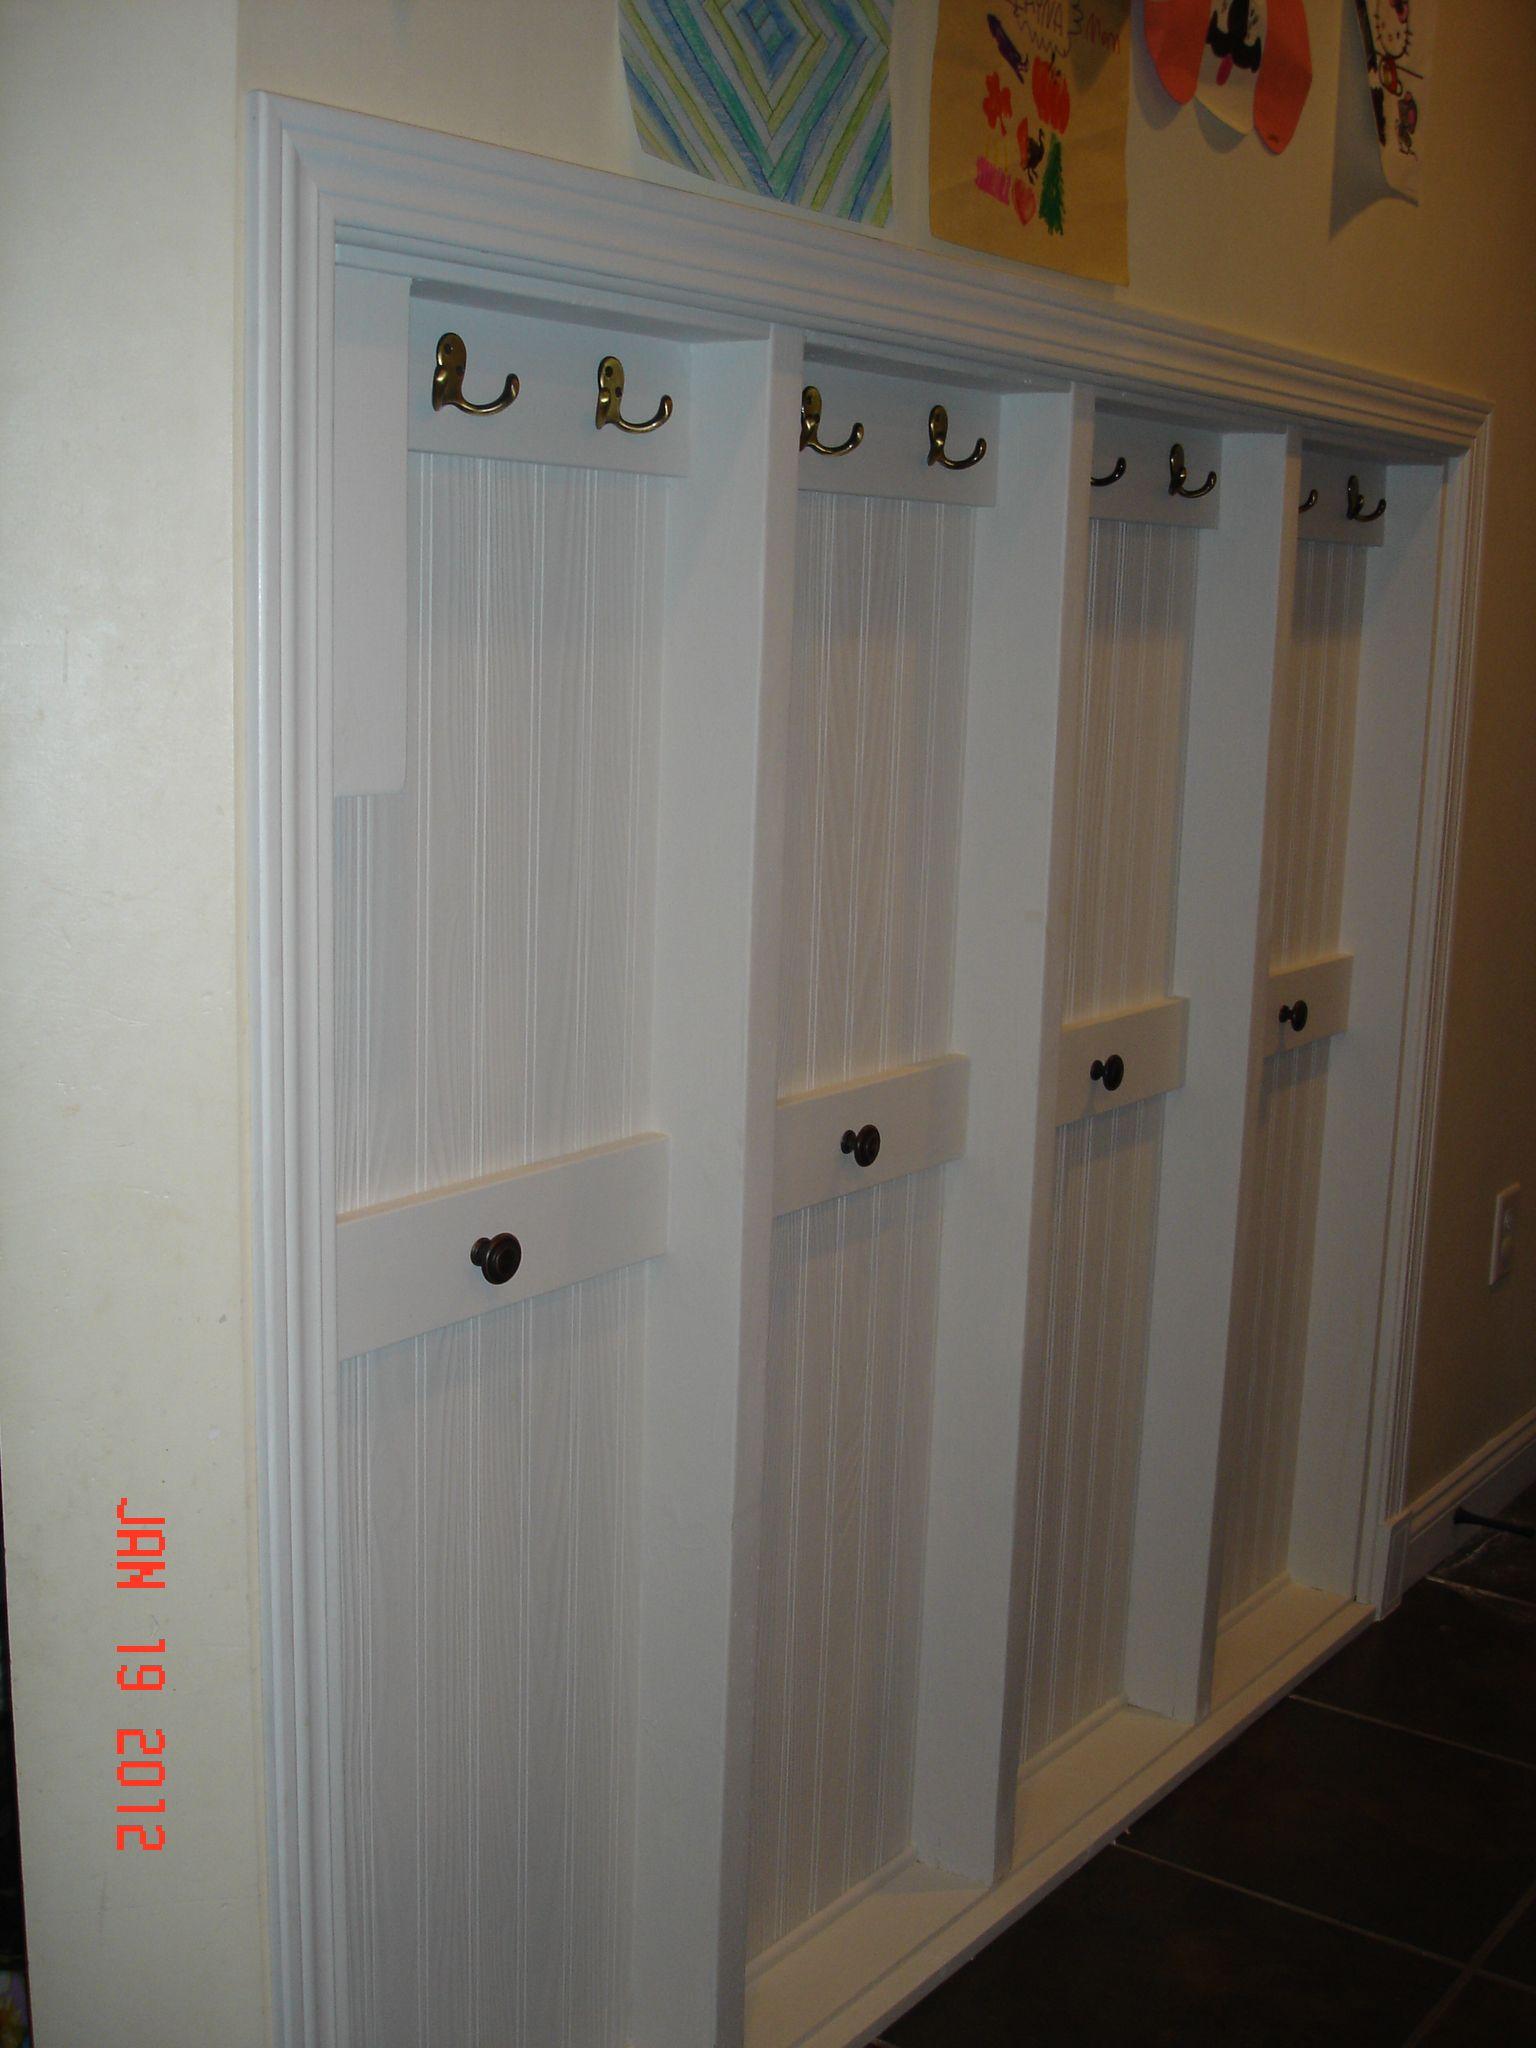 Narrow hallway storage solutions  Cute idea for kidsu hooks in foyer  DIMyself  Pinterest  Pocket